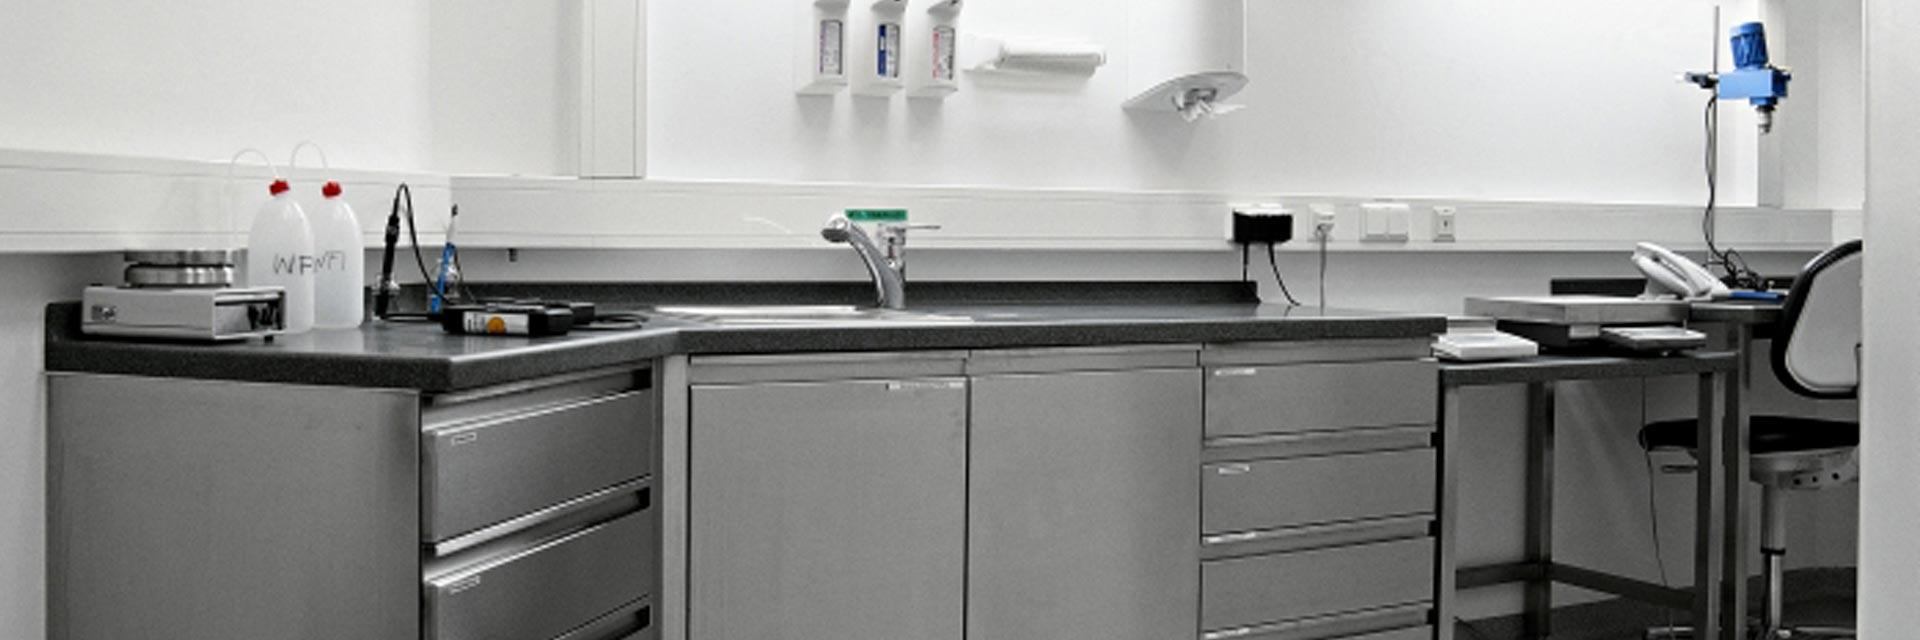 ladenbau und labor metagro edelstahltechnik ag. Black Bedroom Furniture Sets. Home Design Ideas